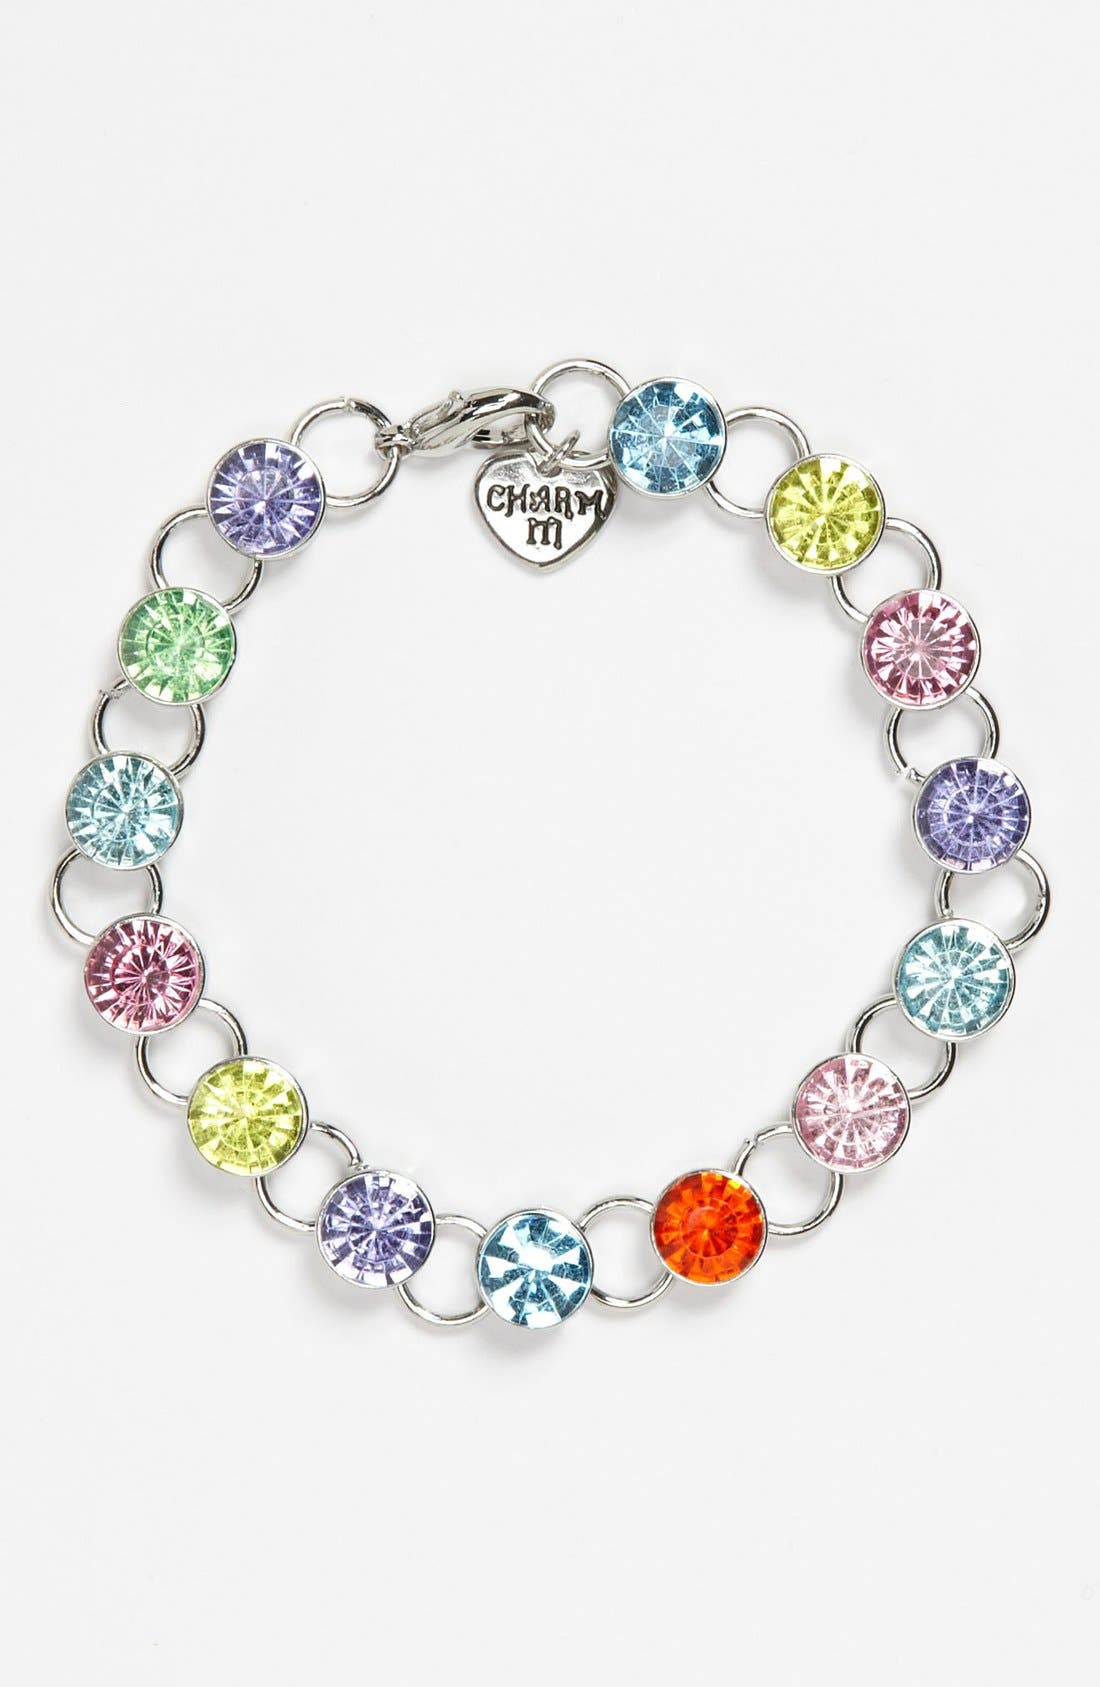 Main Image - CHARM IT!® Link Bracelet (Girls)